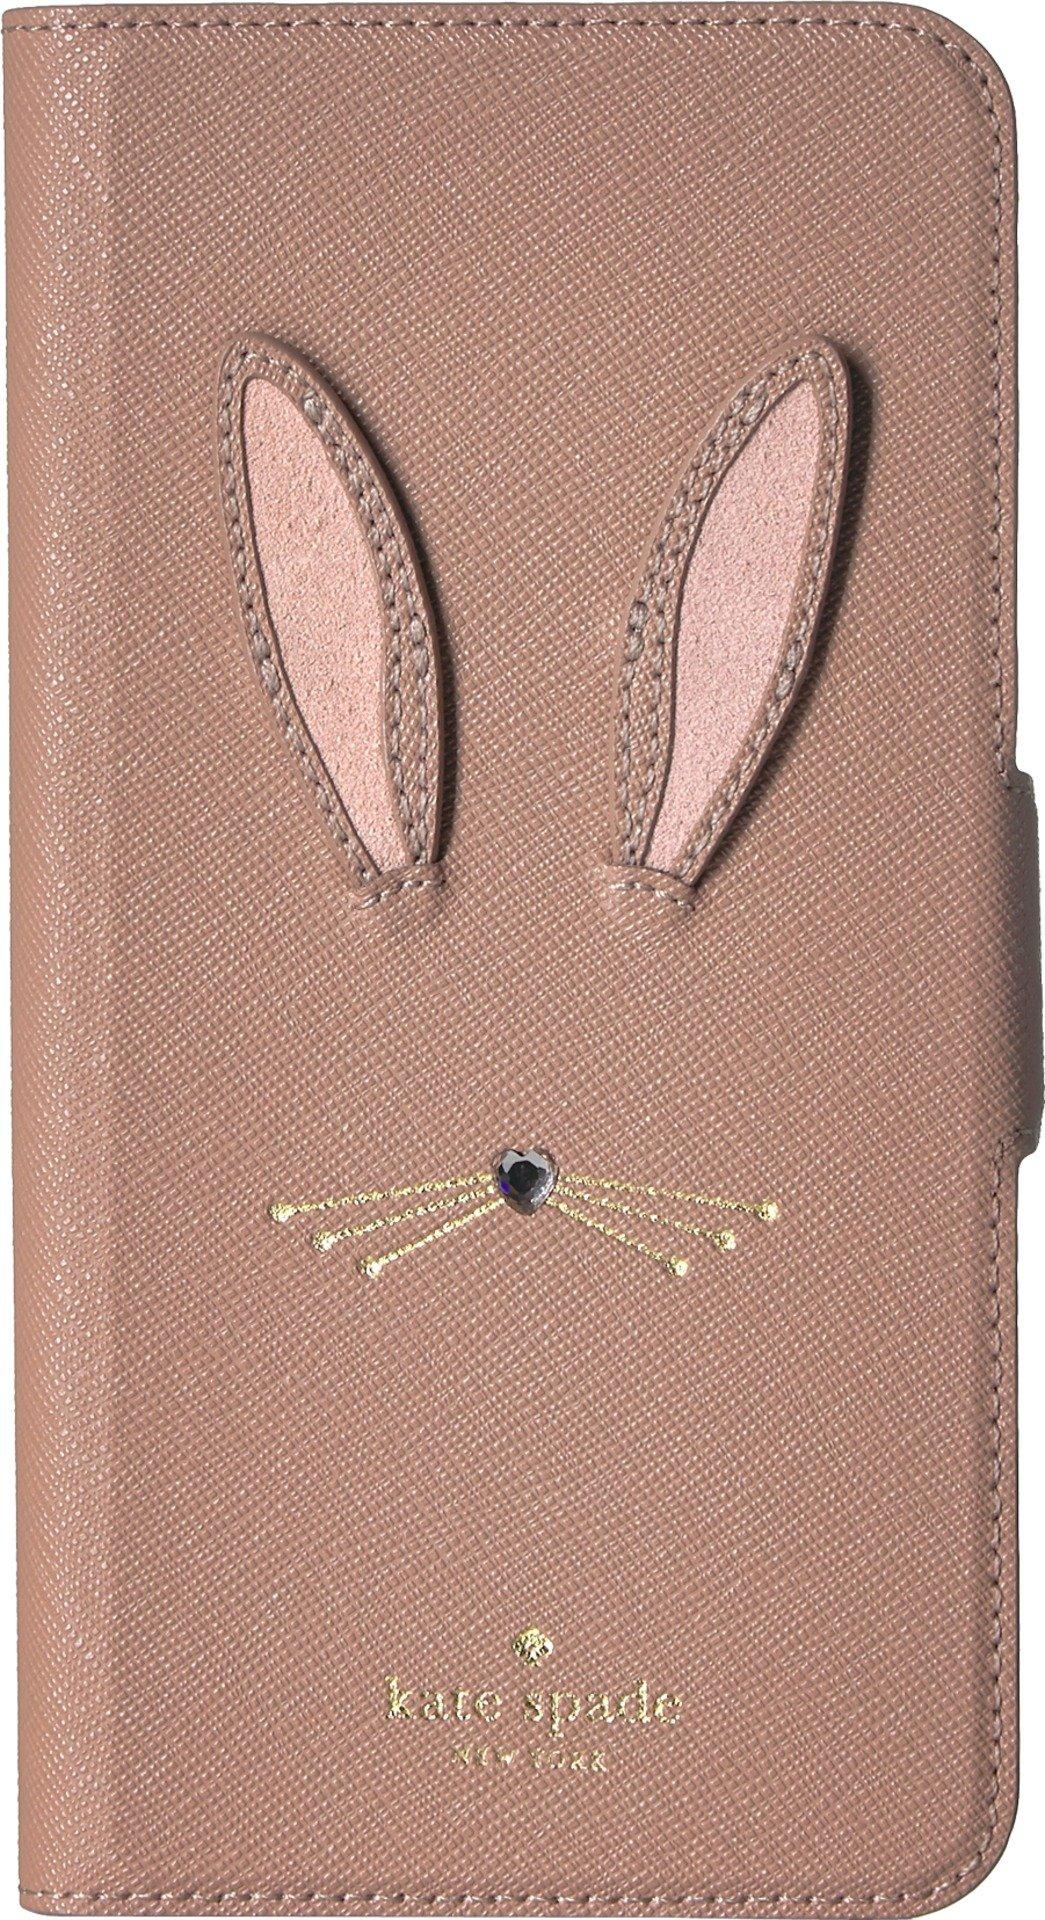 Kate Spade New York Women's Rabbit Applique Folio Phone Case for iPhone 8 Plus Tan Multi One Size